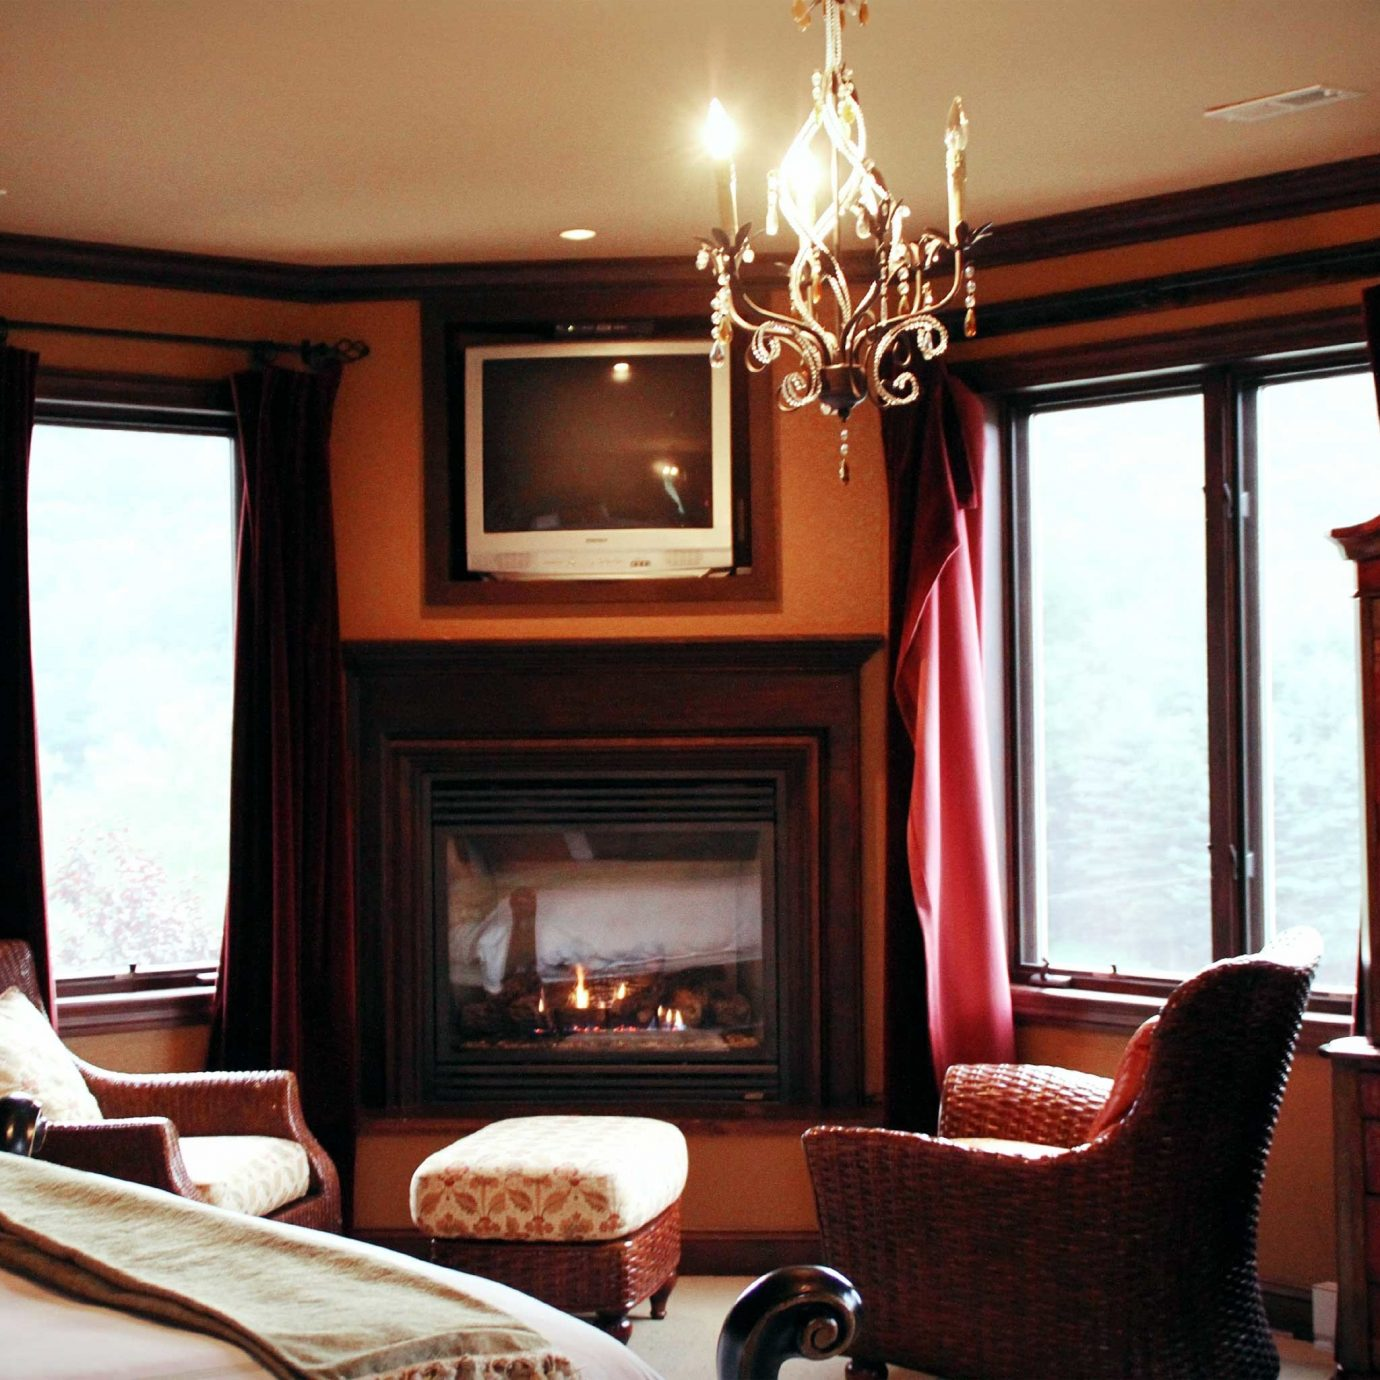 Bedroom Elegant Fireplace Lounge Modern Winery property living room Suite home cottage